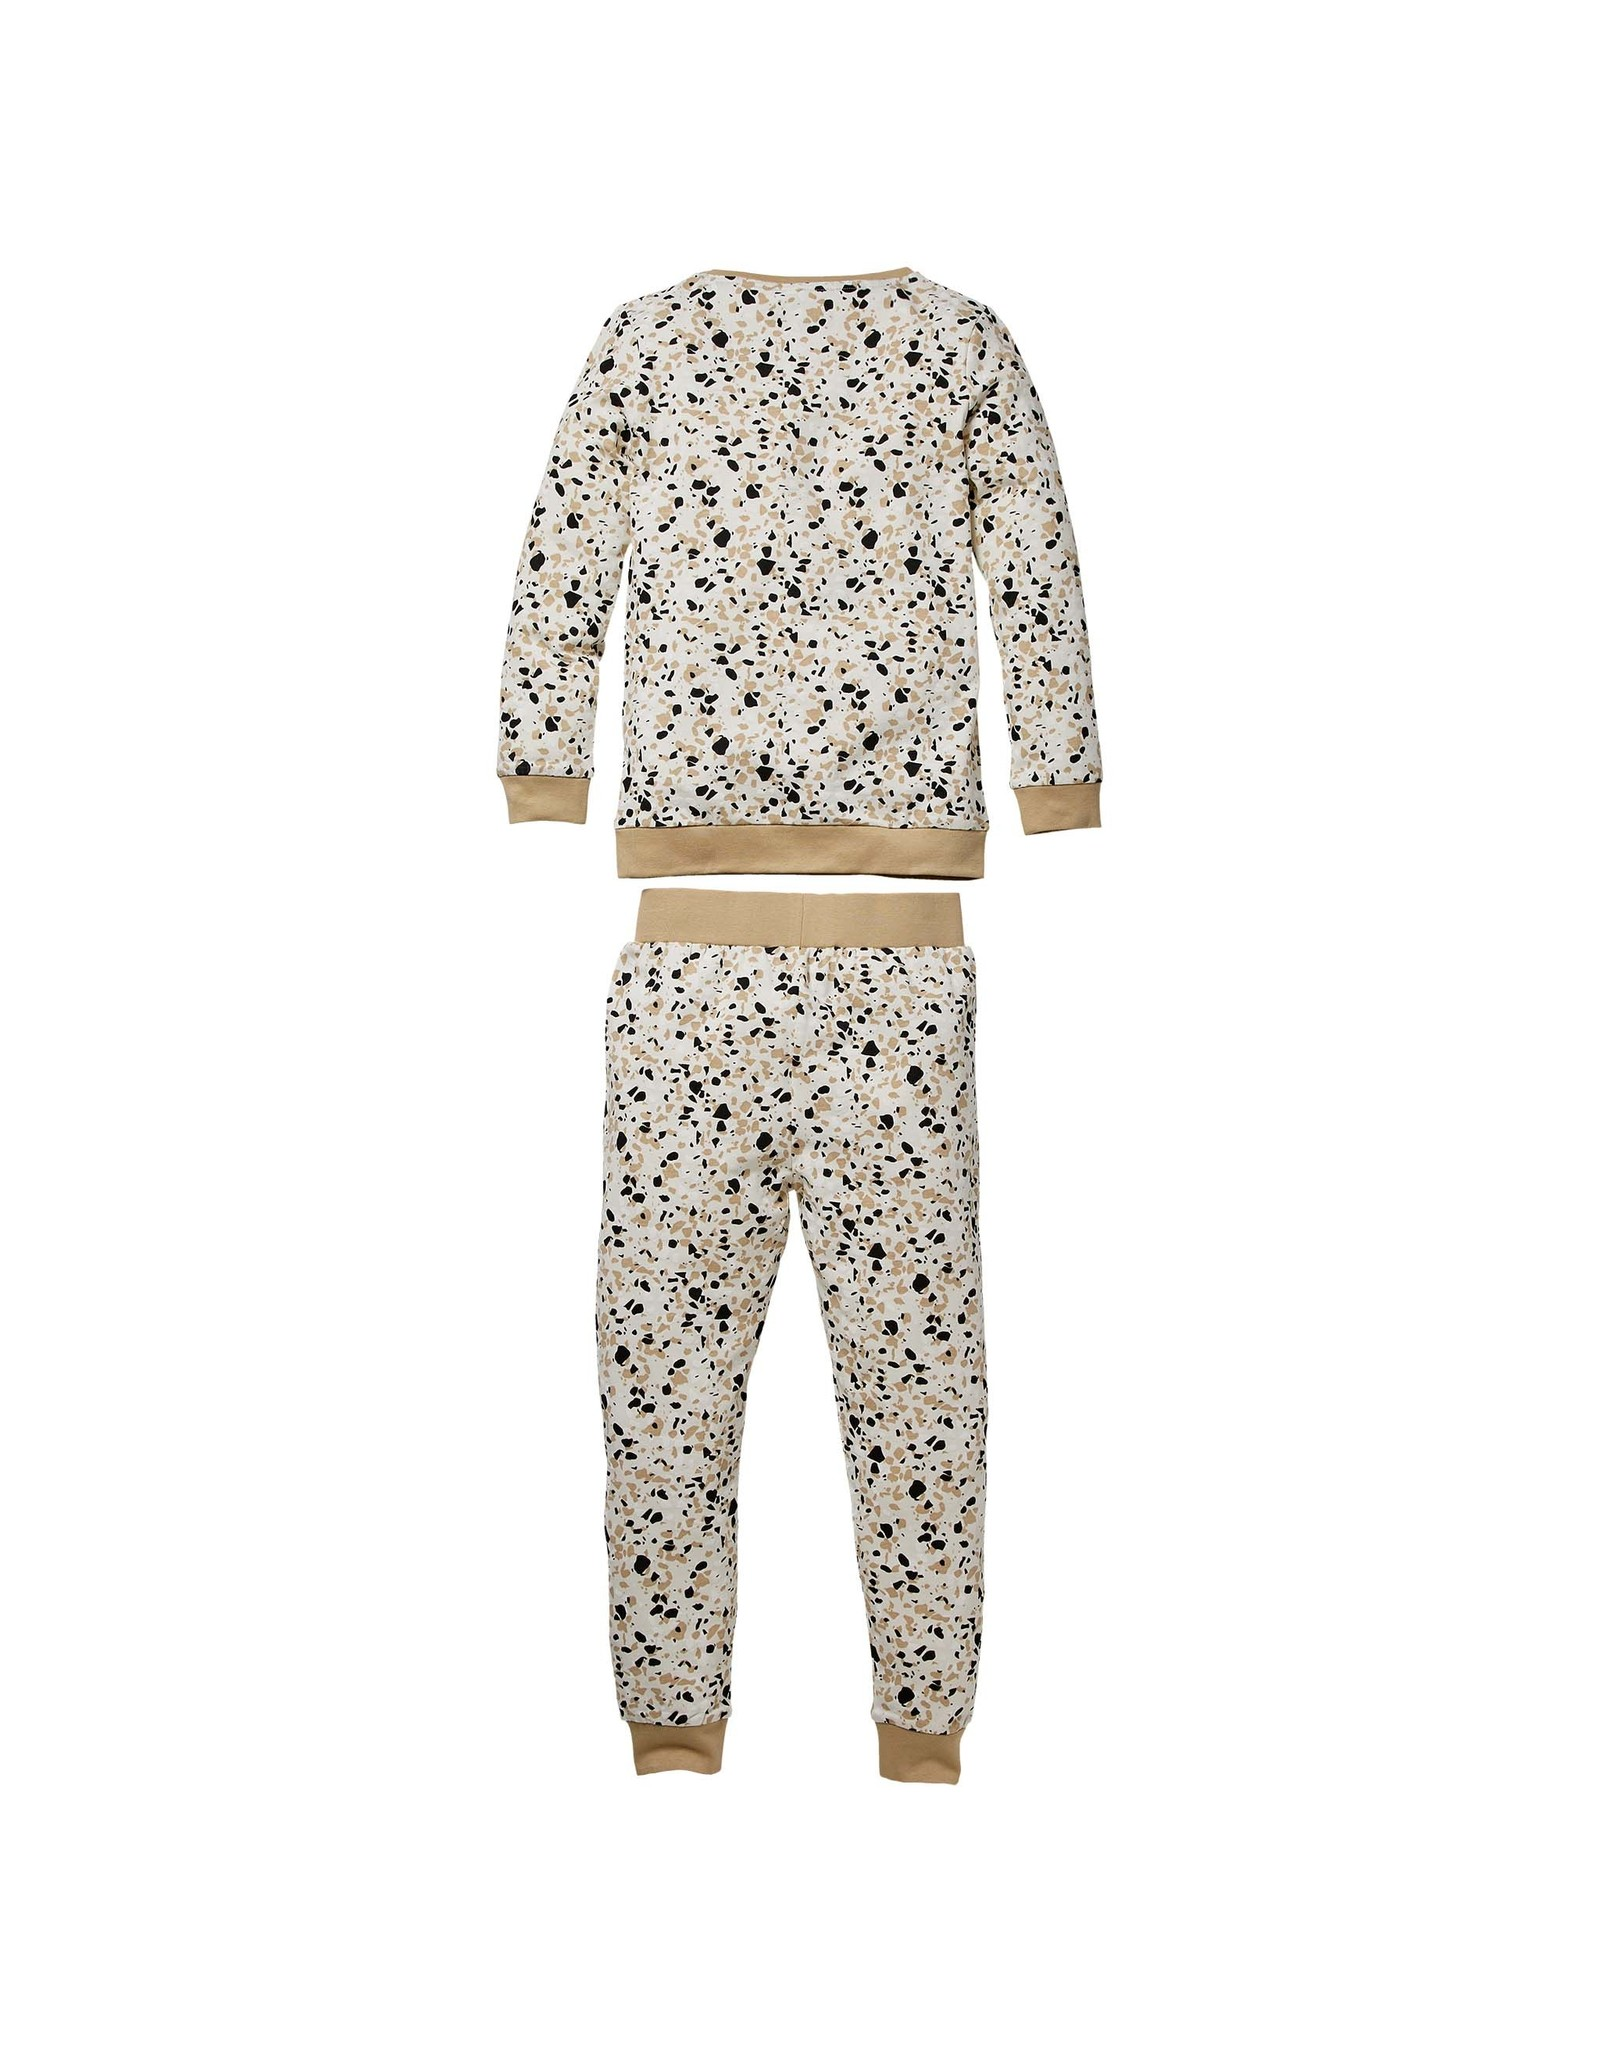 Quapi Quapi baby pyjama Puck Off White splash